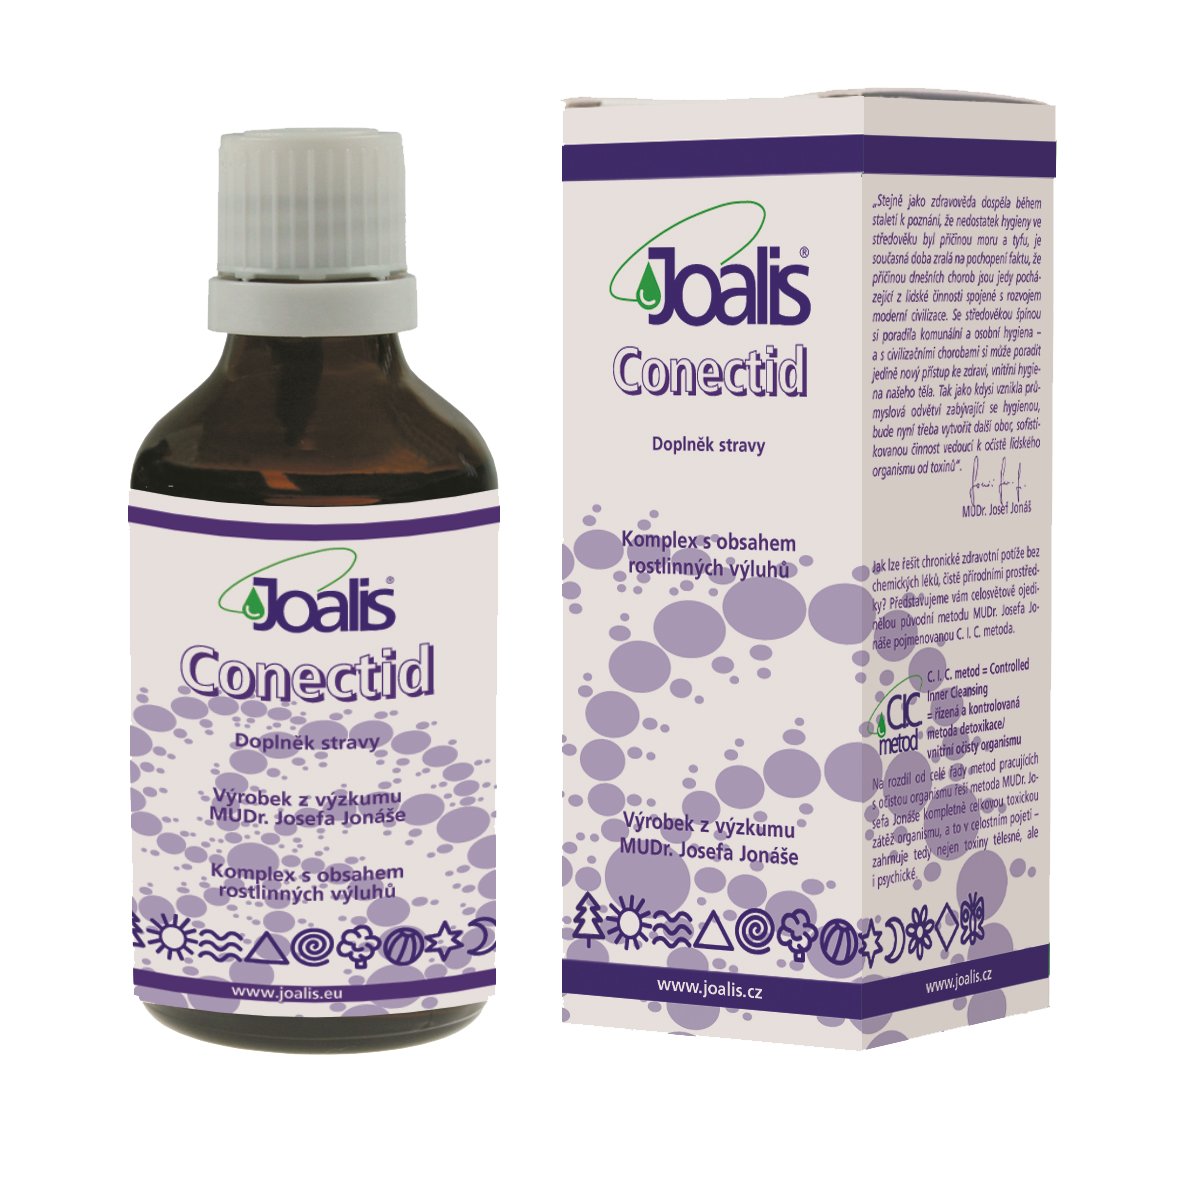 Joalis Conectid, 50ml